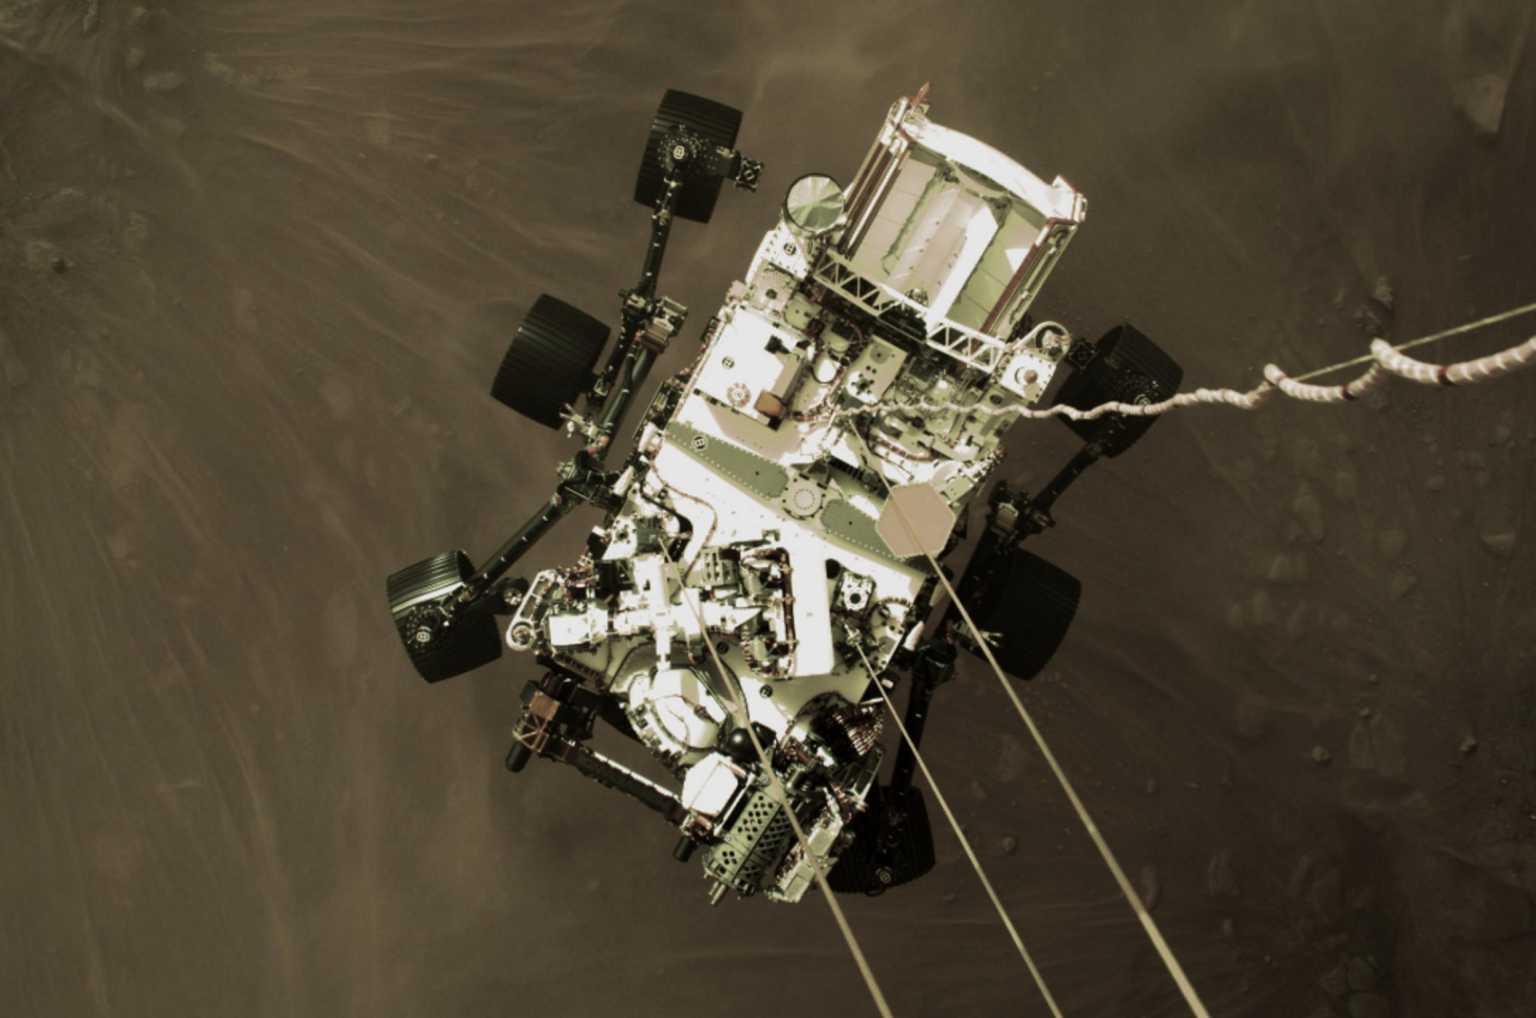 Perseverance: Ιδού ο πλανήτης Άρης – Νέες συγκλονιστικές εικόνες από την στιγμή της προσεδάφισης